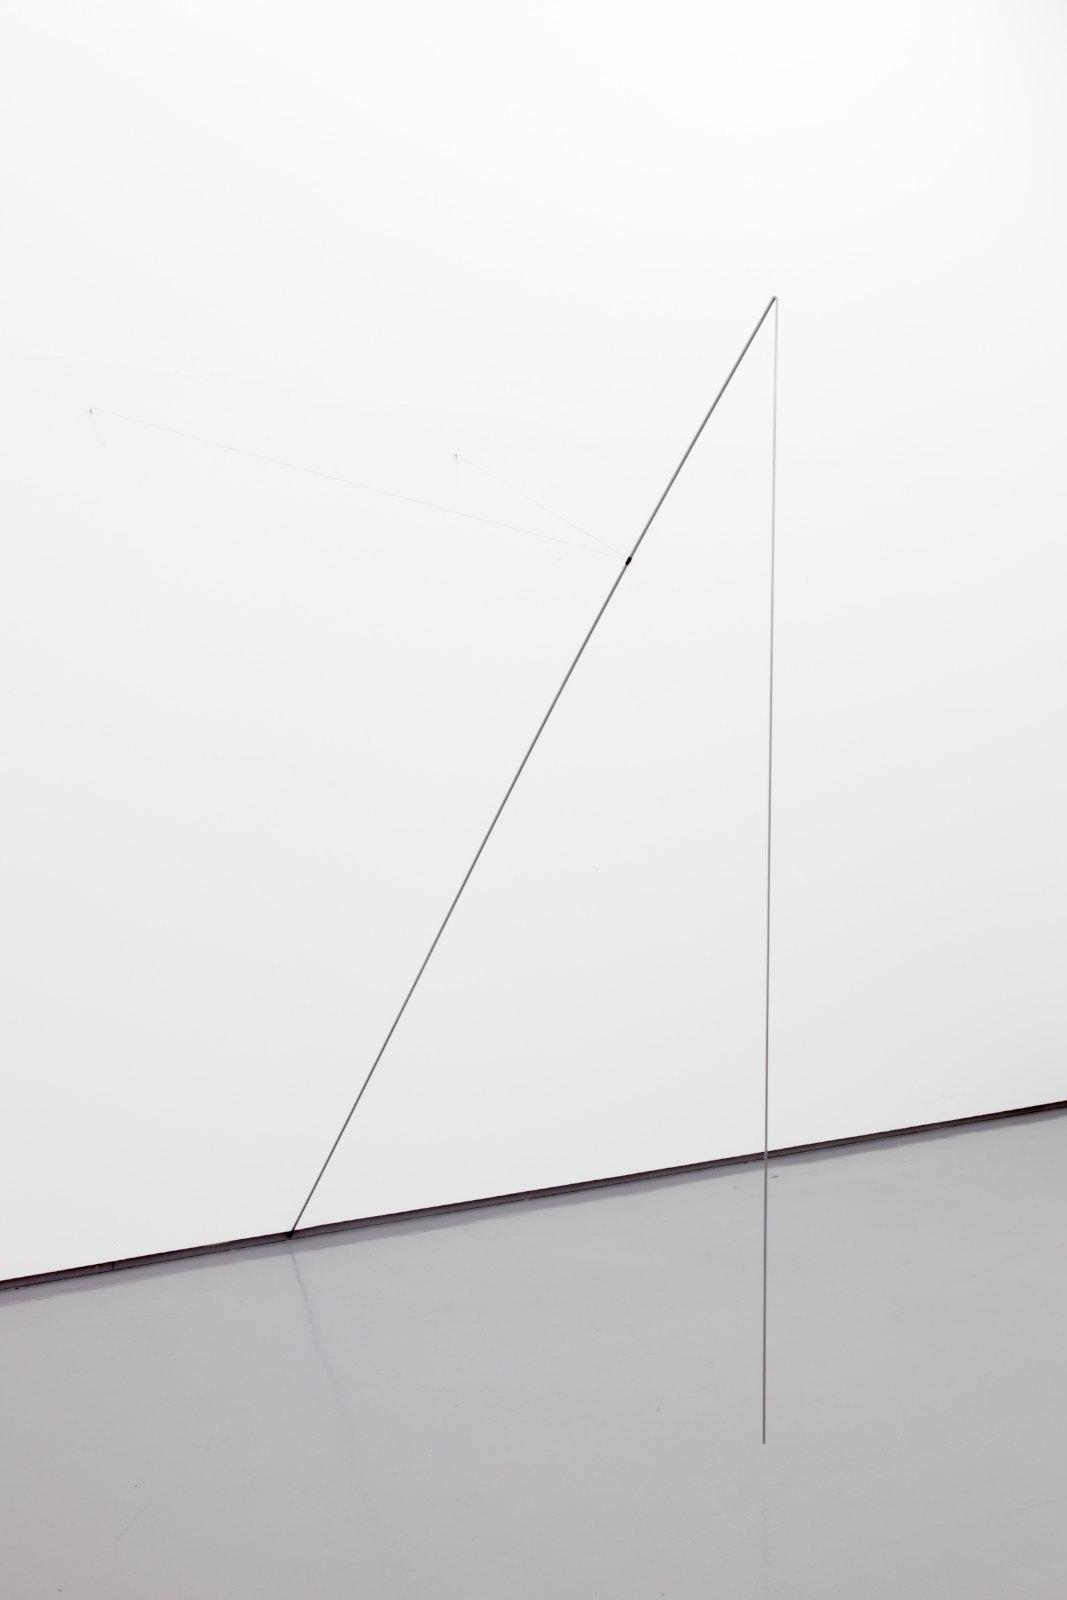 Tone Vigeland, Sculpture II, 2004, Steel, silver, 220 x 214 x 207 cm